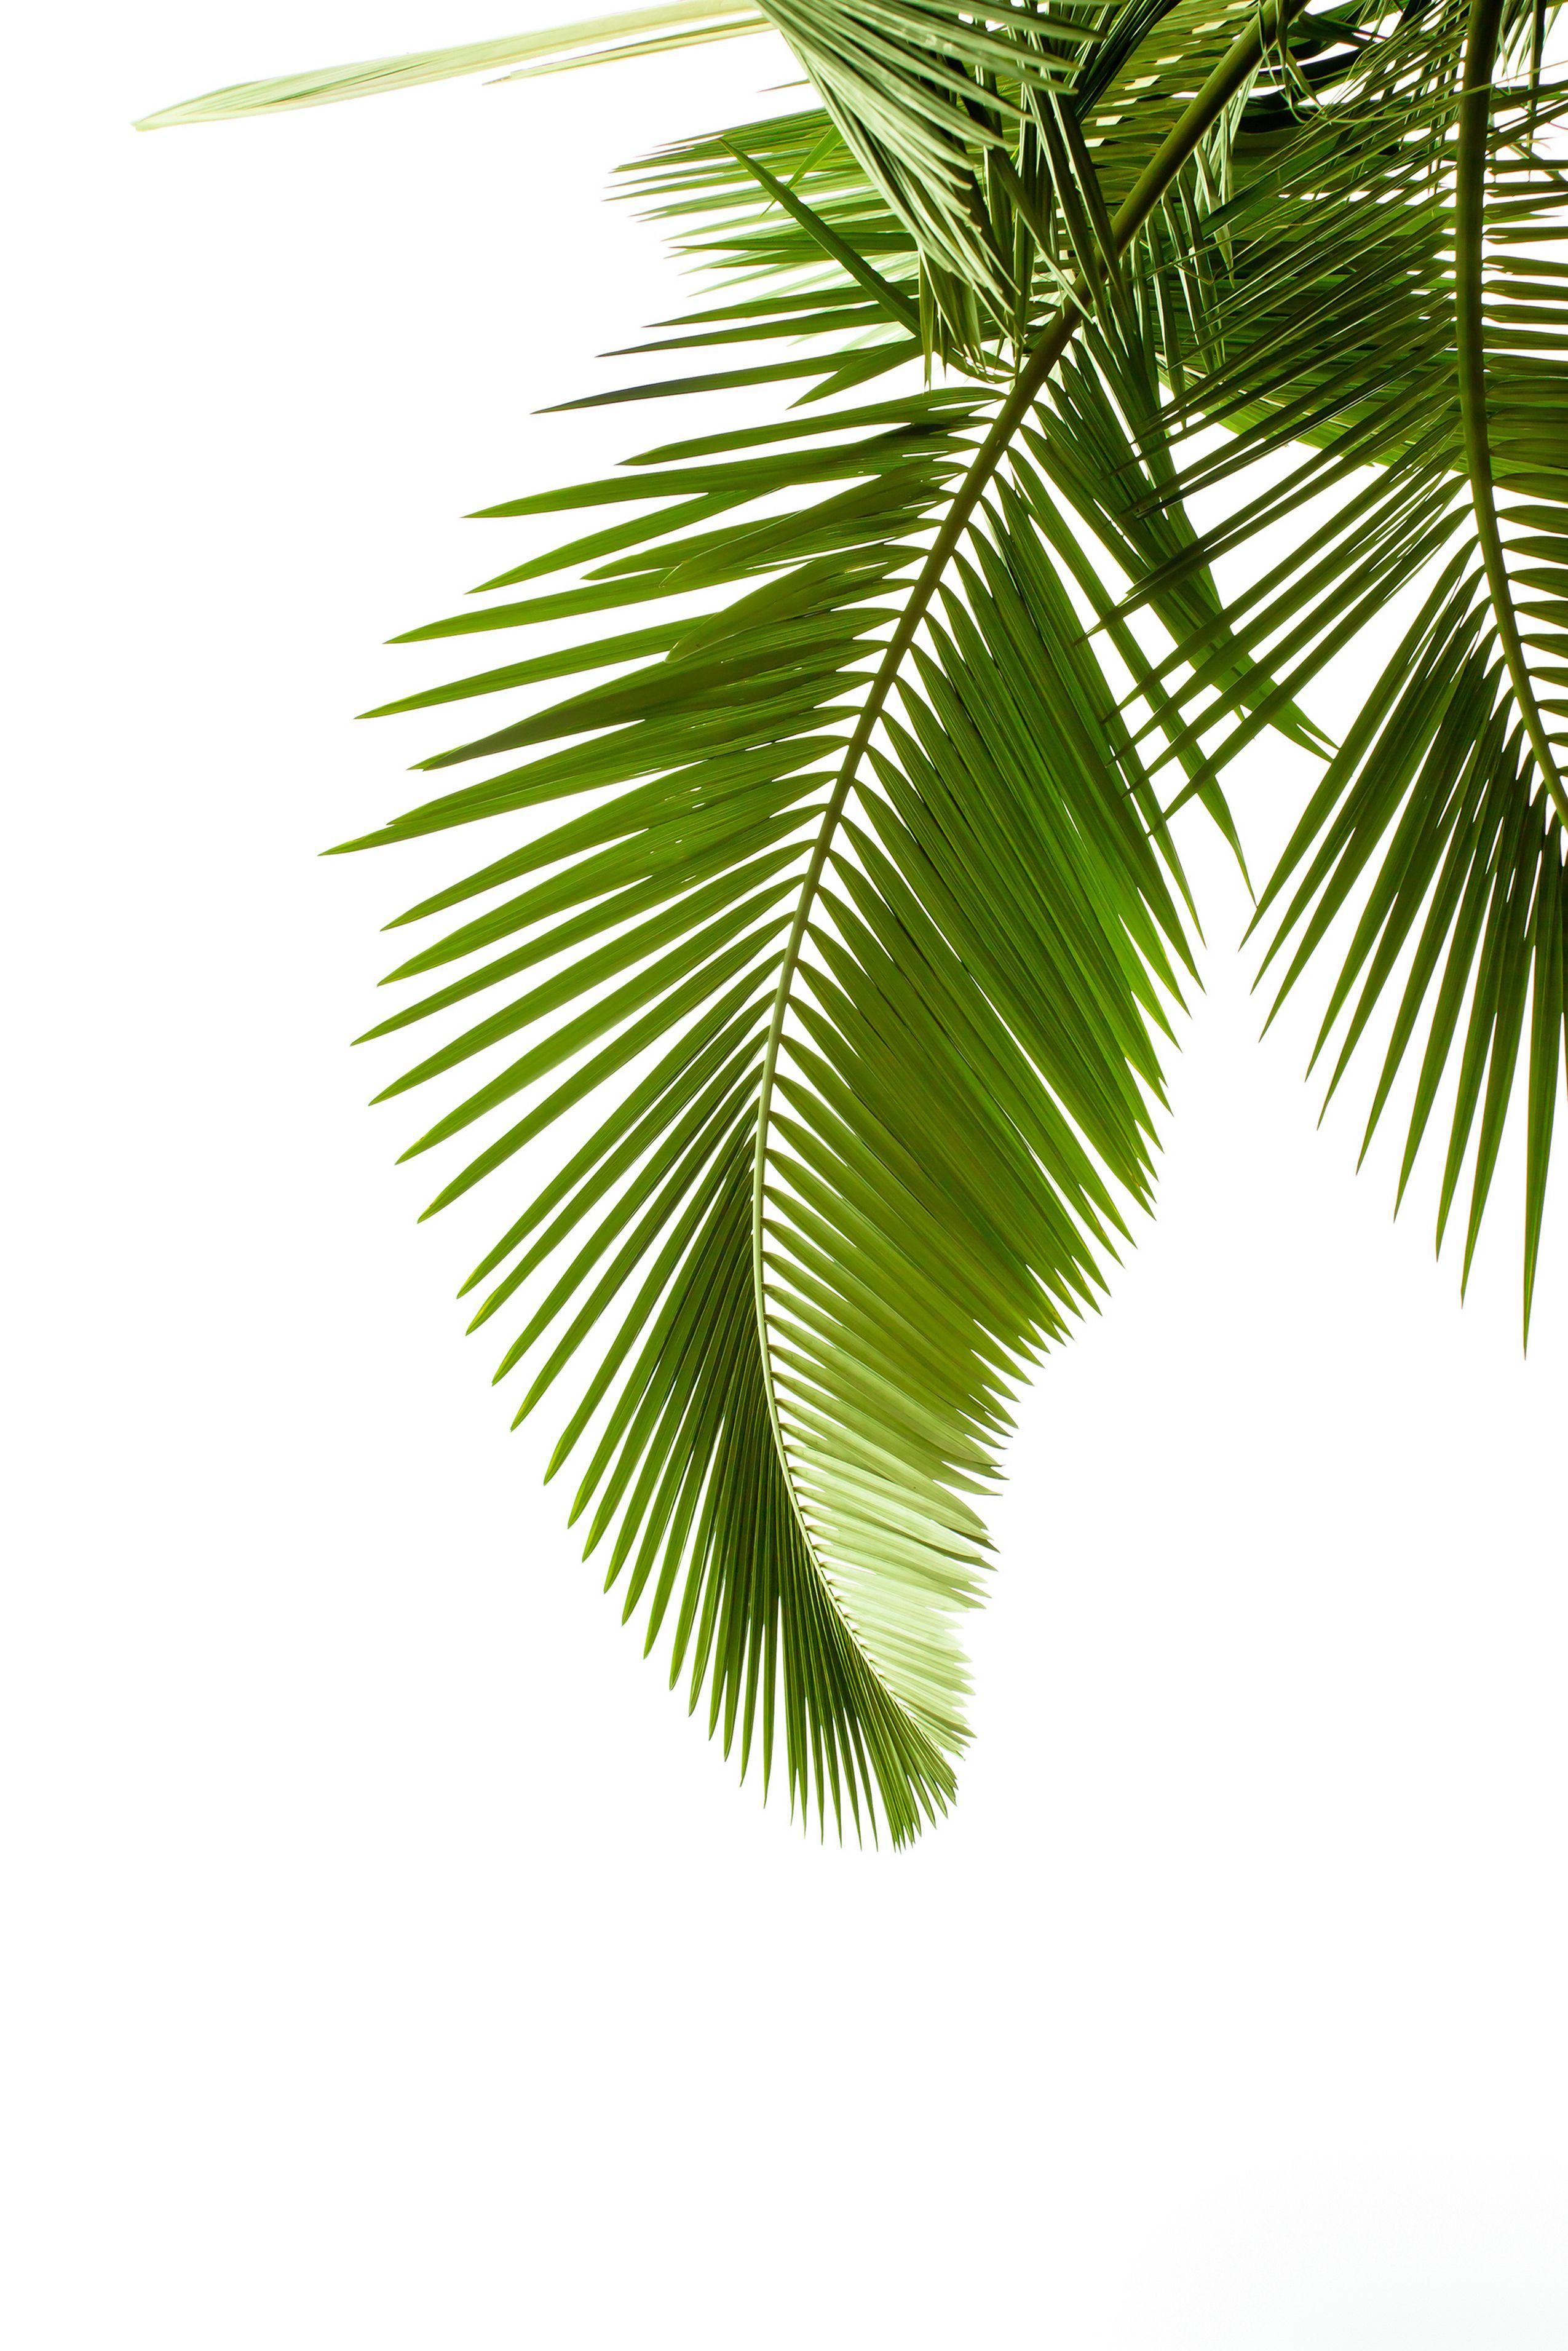 Green Tropical Plant Palm Leaf Border Palm Leaf Botany Plant